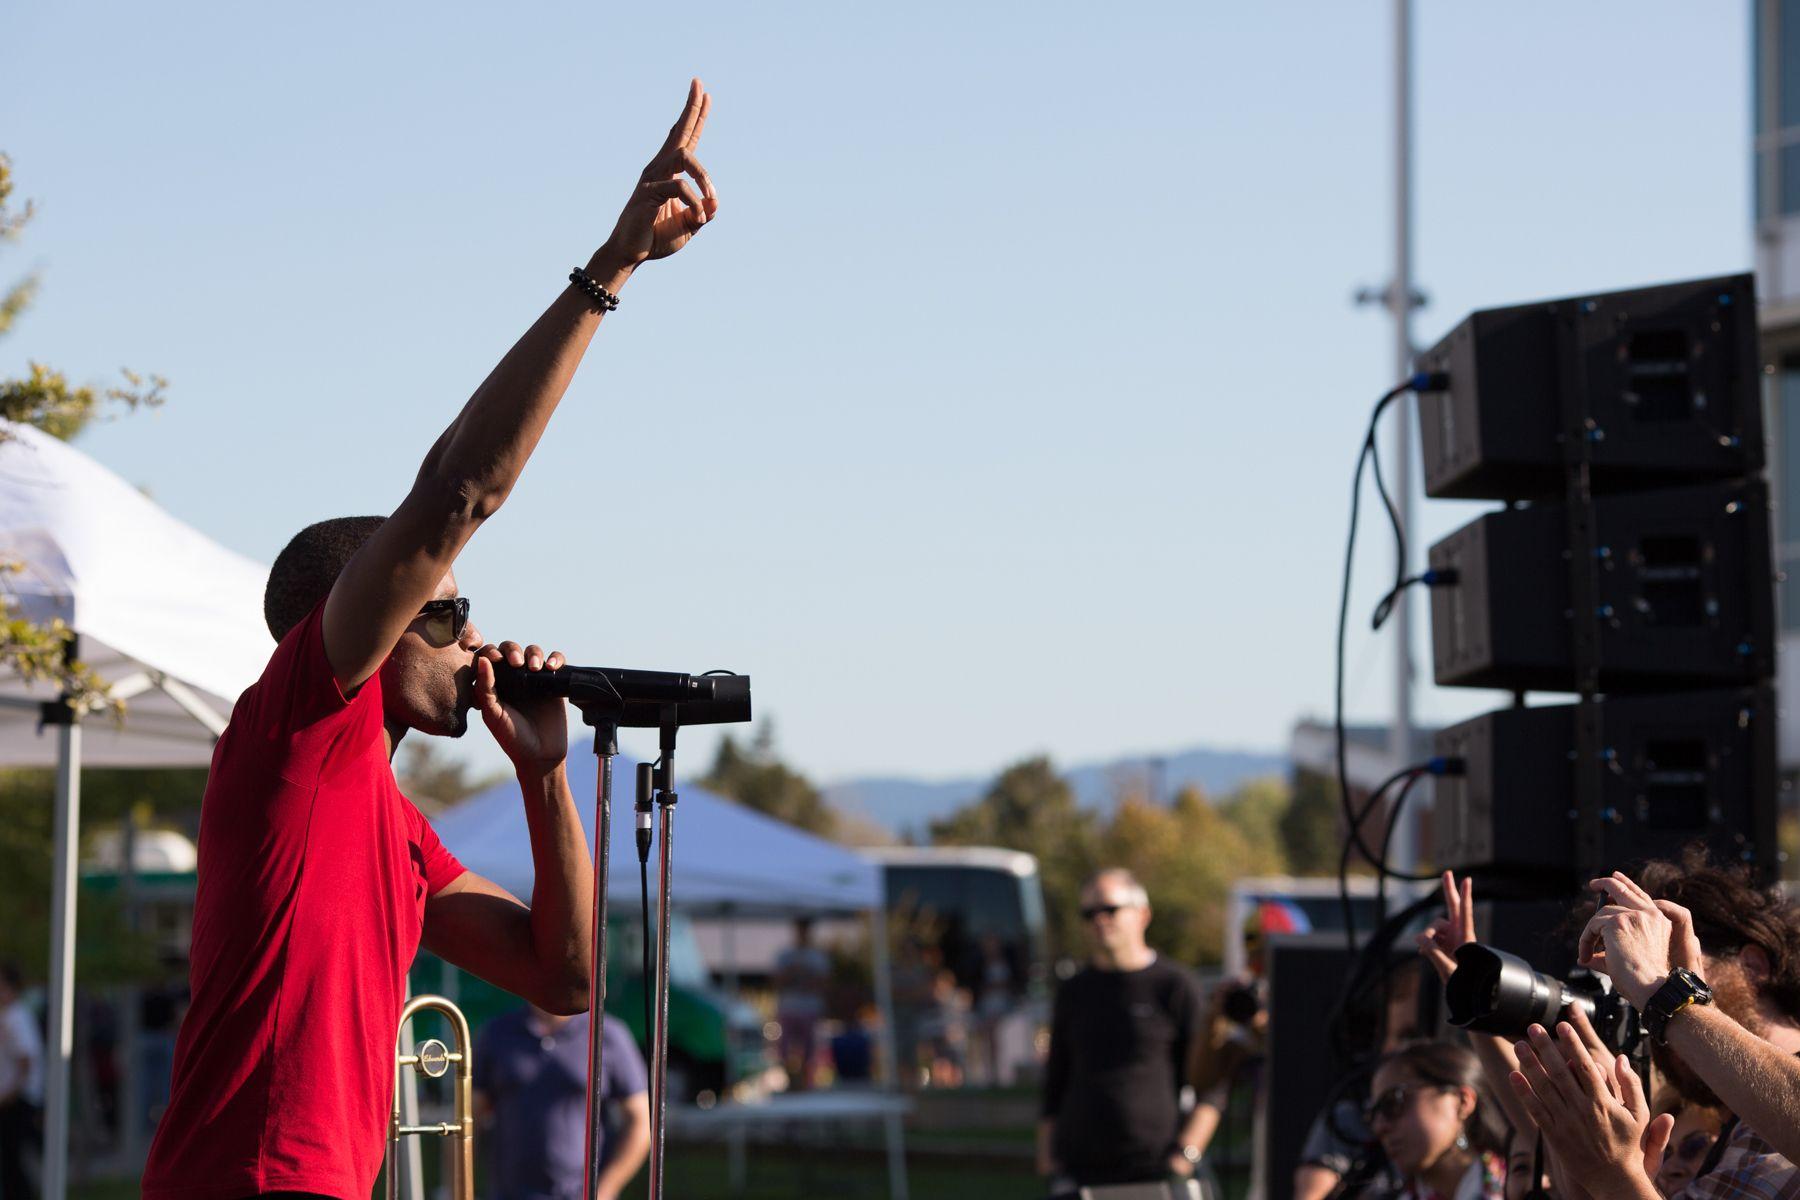 Trombone ShortyCrittfest 2013 | Mountain View, CA